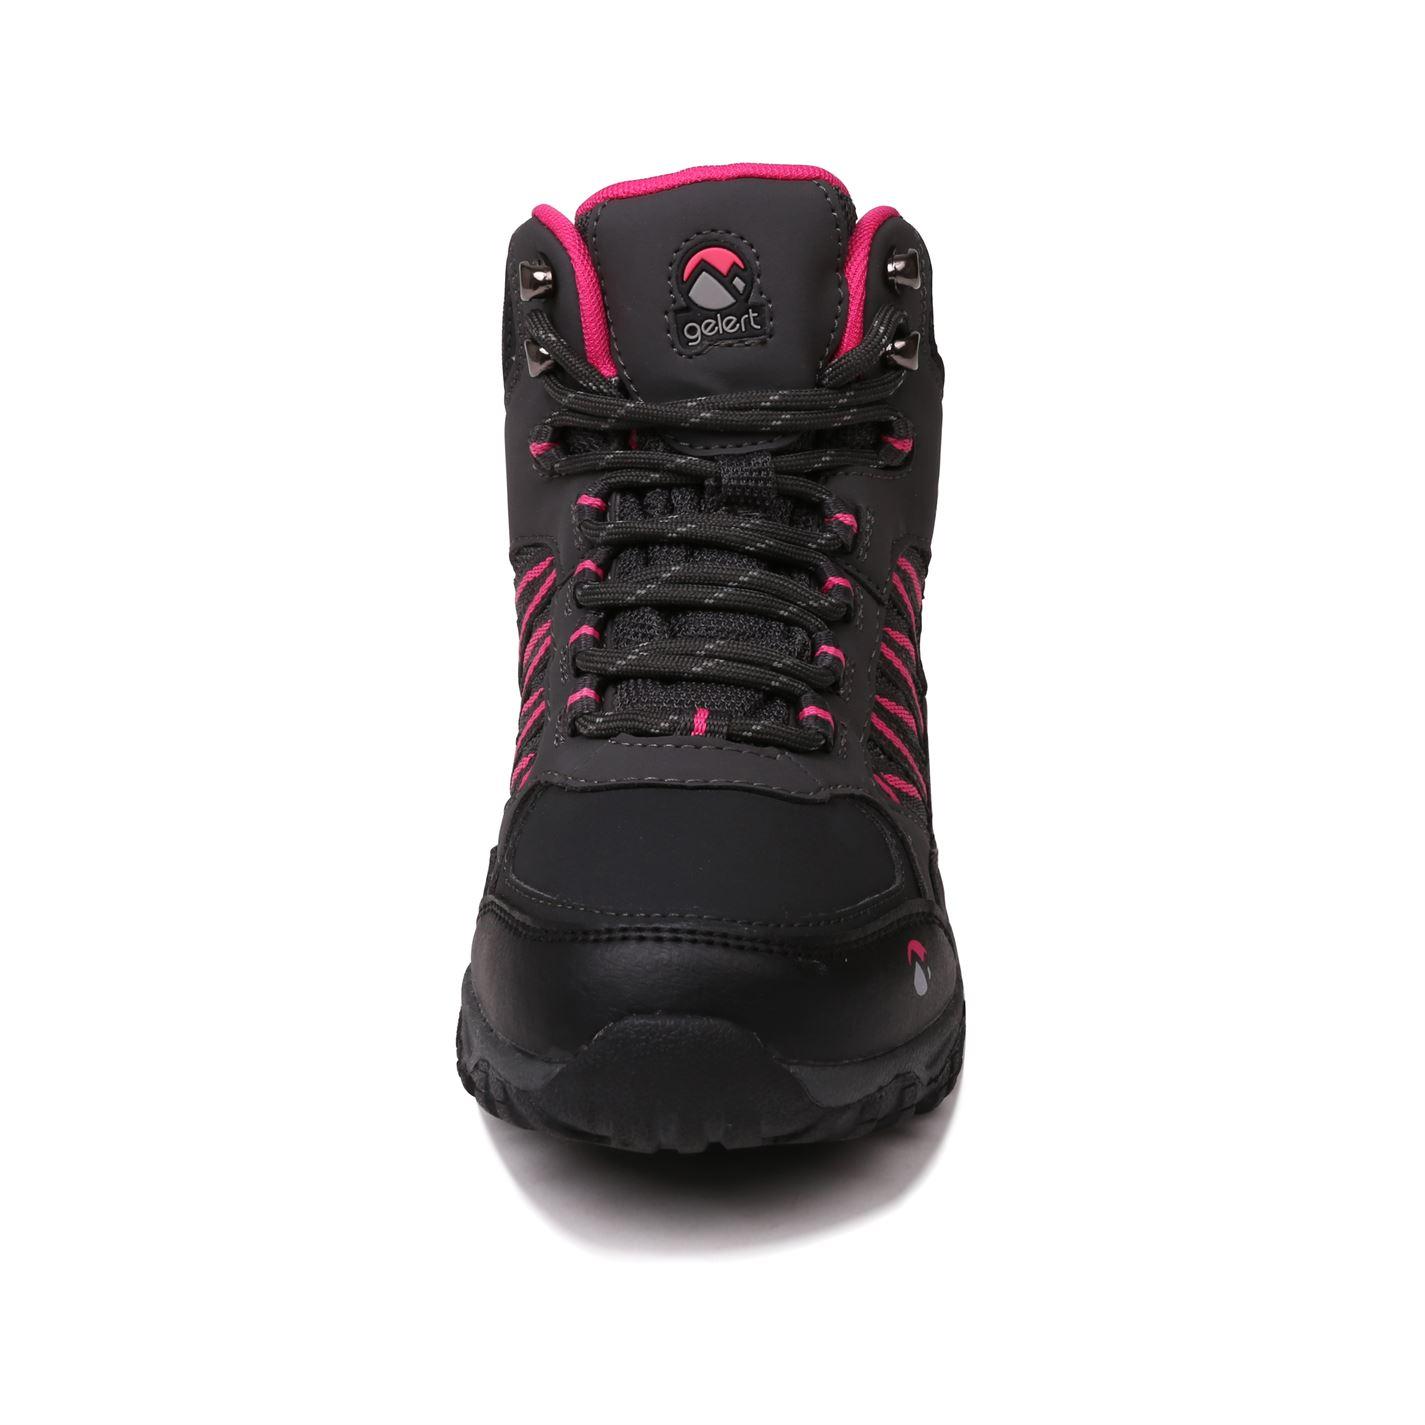 Gelert Childs Horizon Mid Waterproof Walking Boots Laces Fastened Ankle Footwear